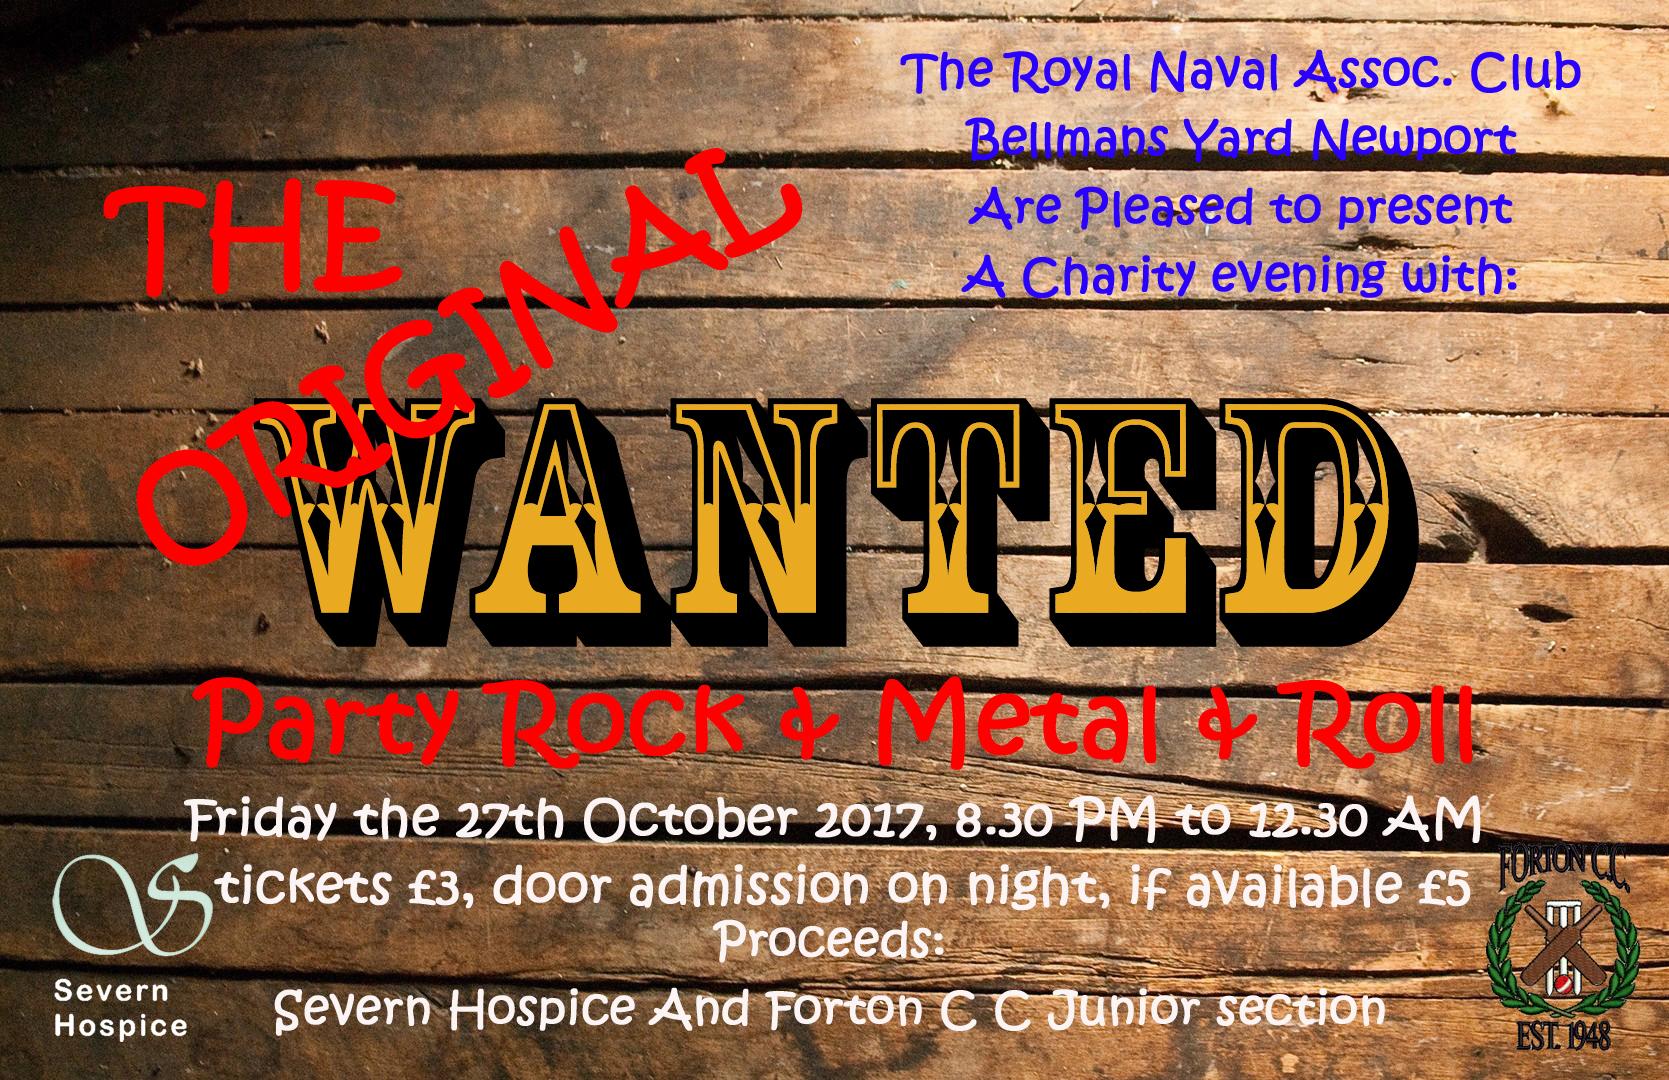 Original_Wanted_poster_2_copy